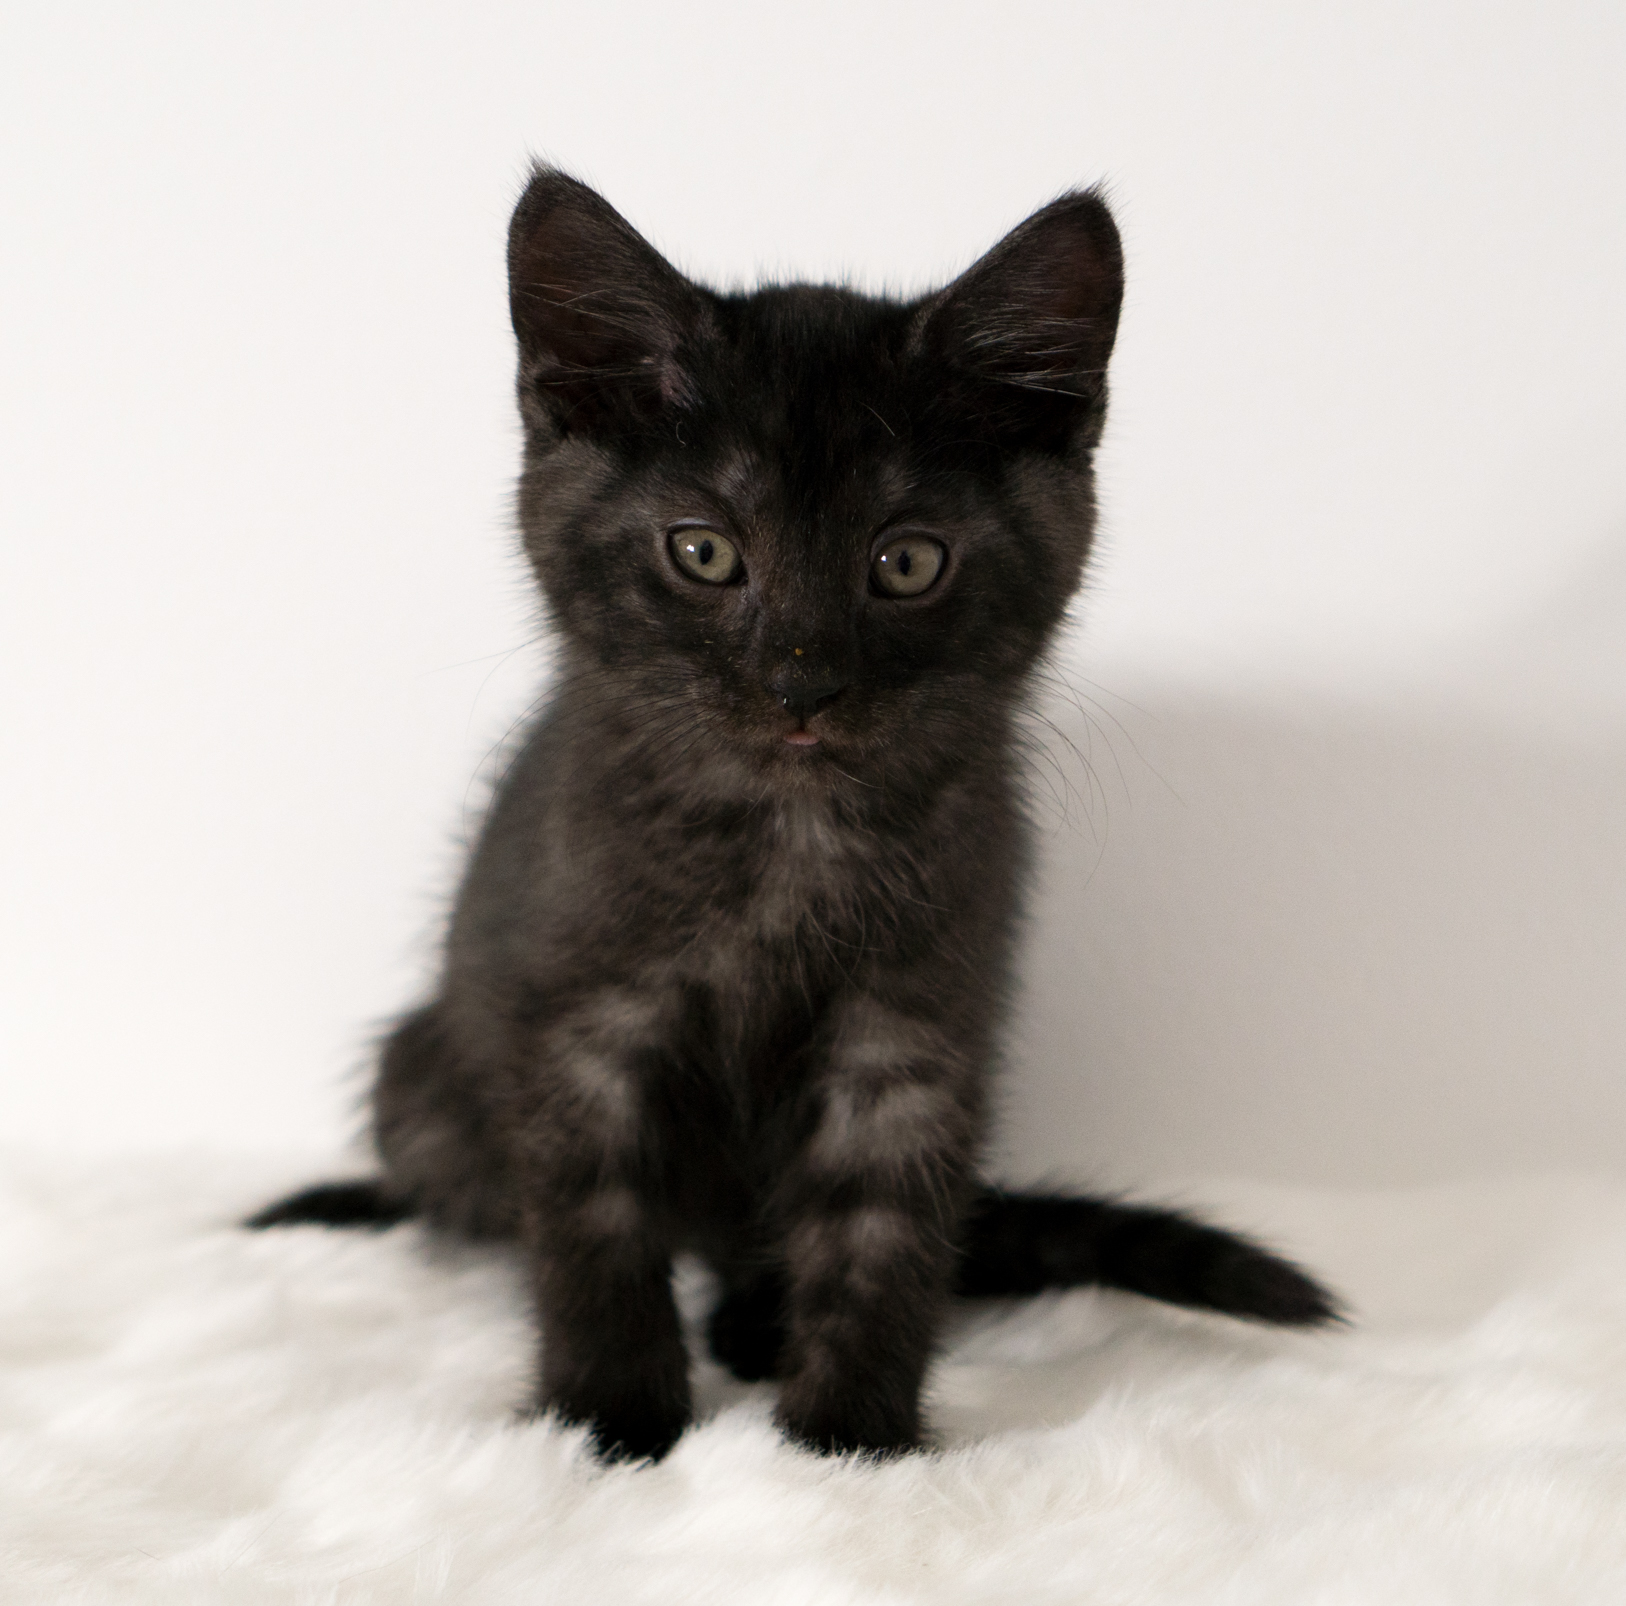 Buckeye - Male - 2 months